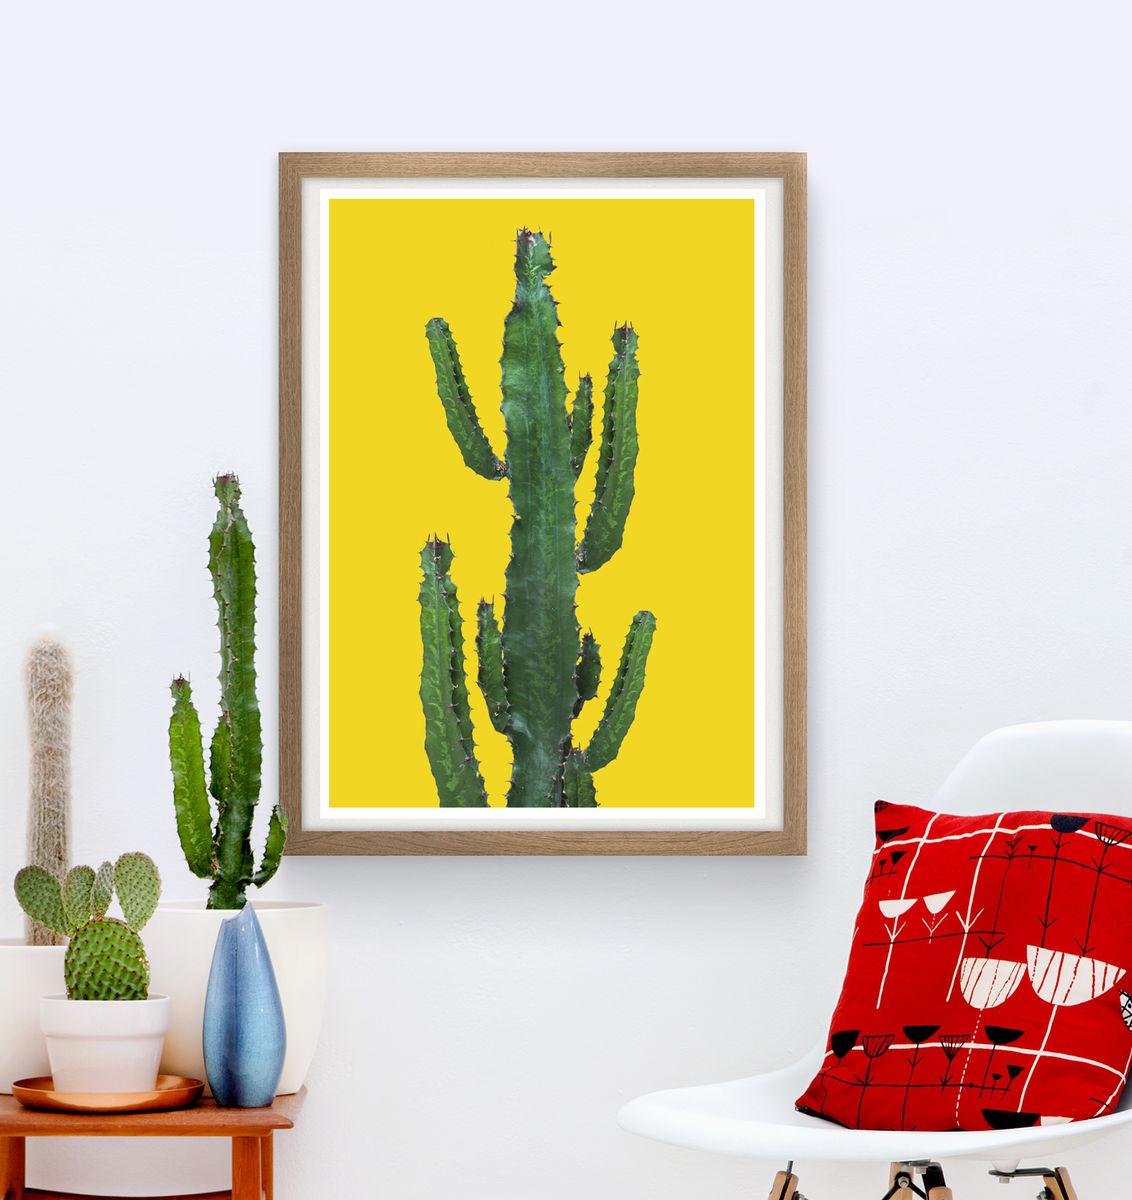 Cactus poster, botanical print, bohemian wall decor - ReStyle Shop